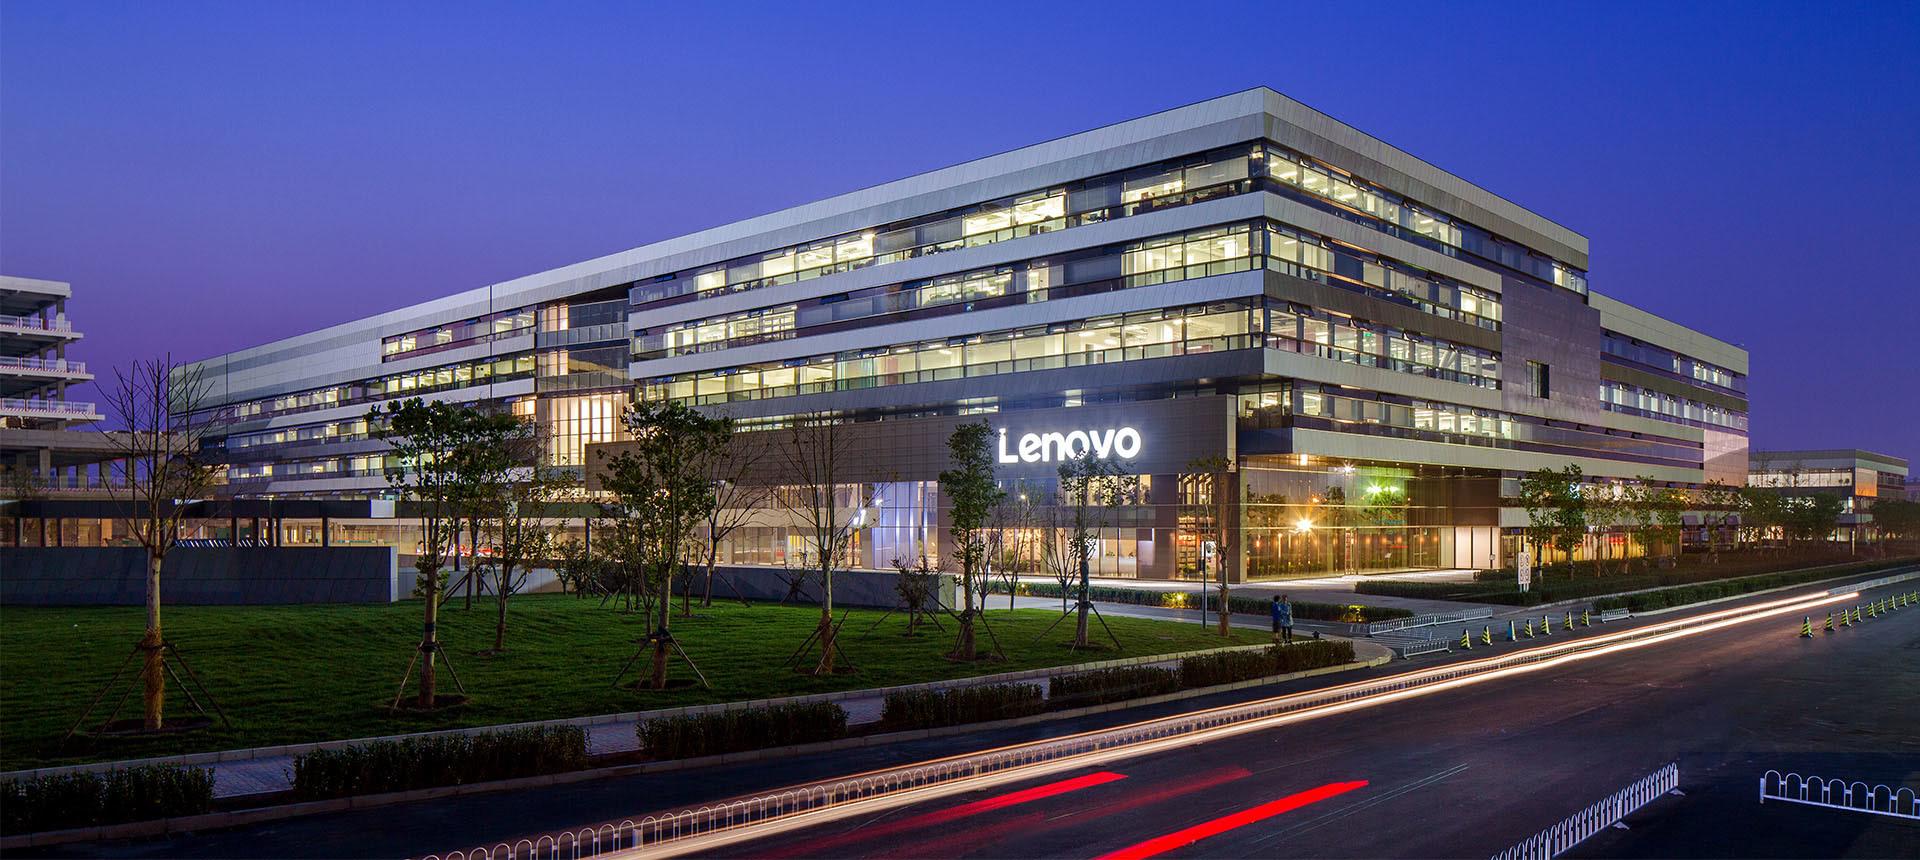 Lenovo Corporate Office